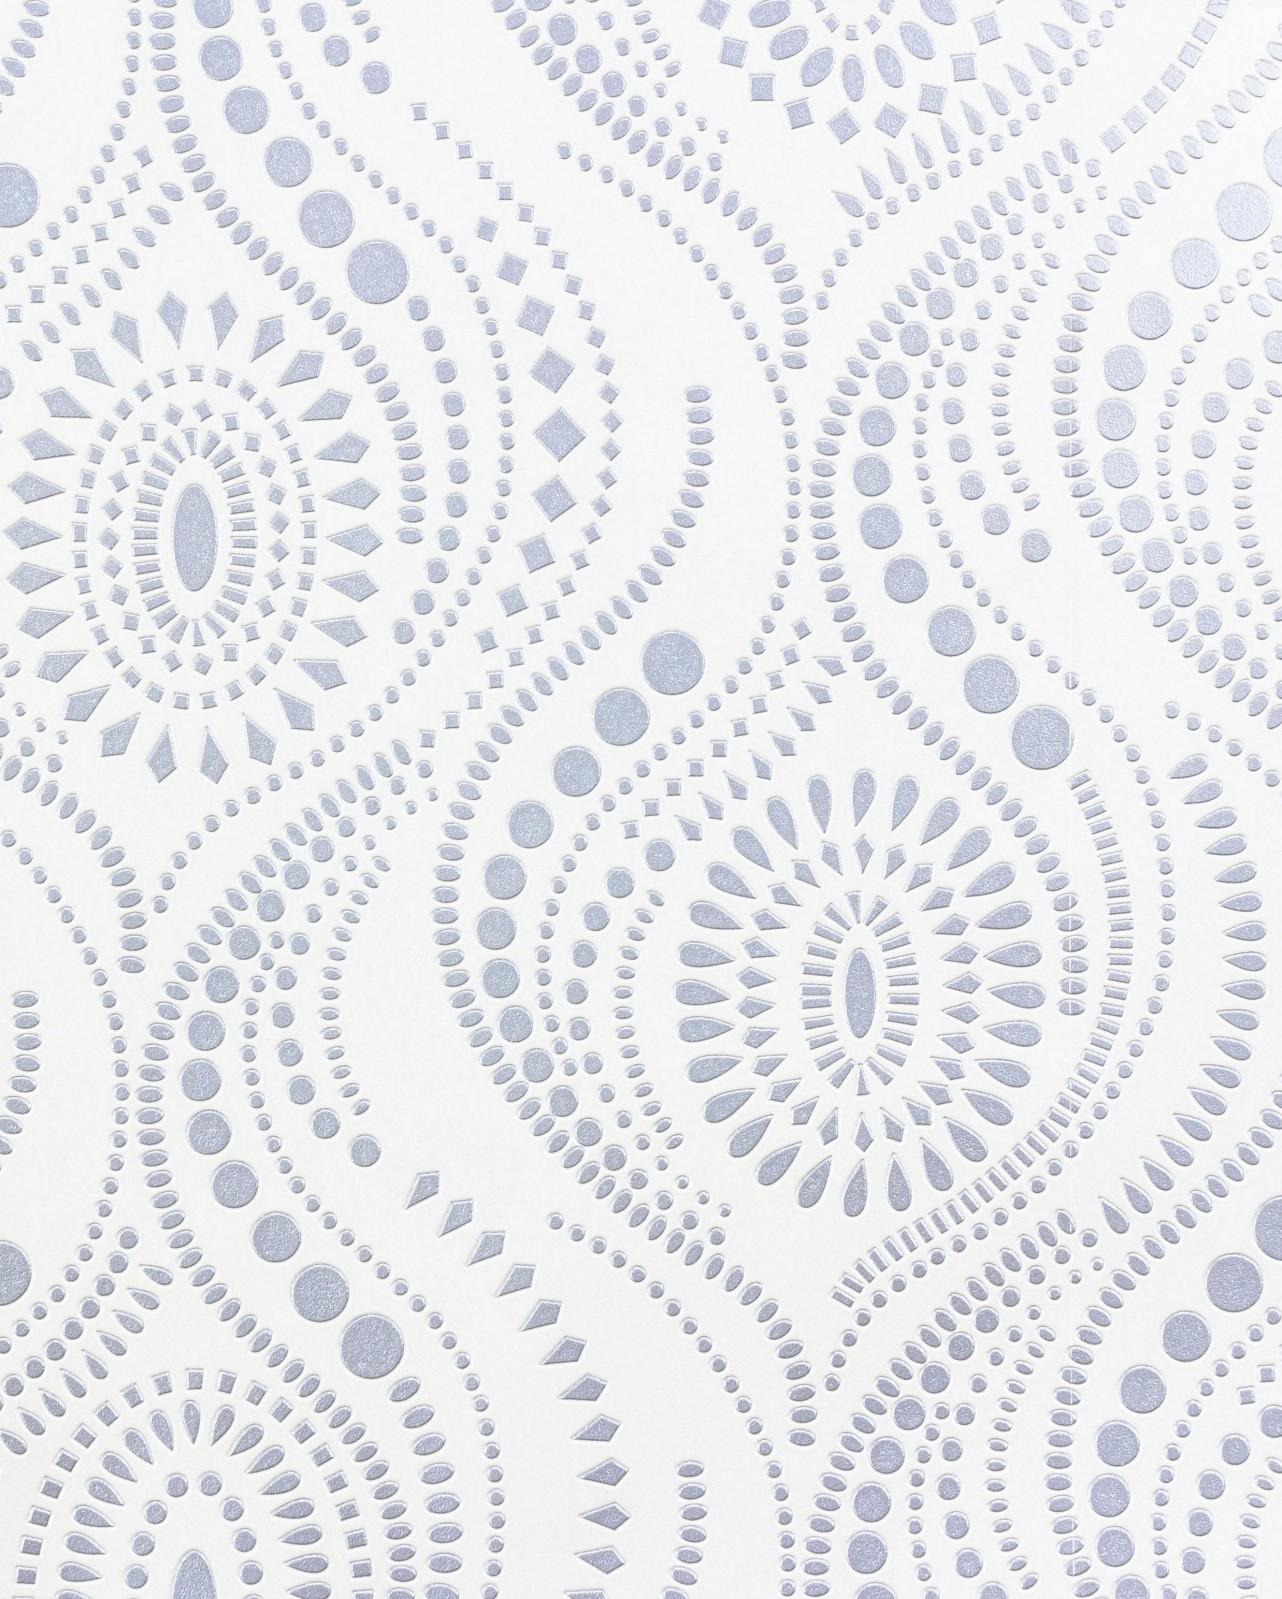 rasch tapete aqua relief k chentapete vinyl tapeten 822410 tapete retro wei sil ebay. Black Bedroom Furniture Sets. Home Design Ideas